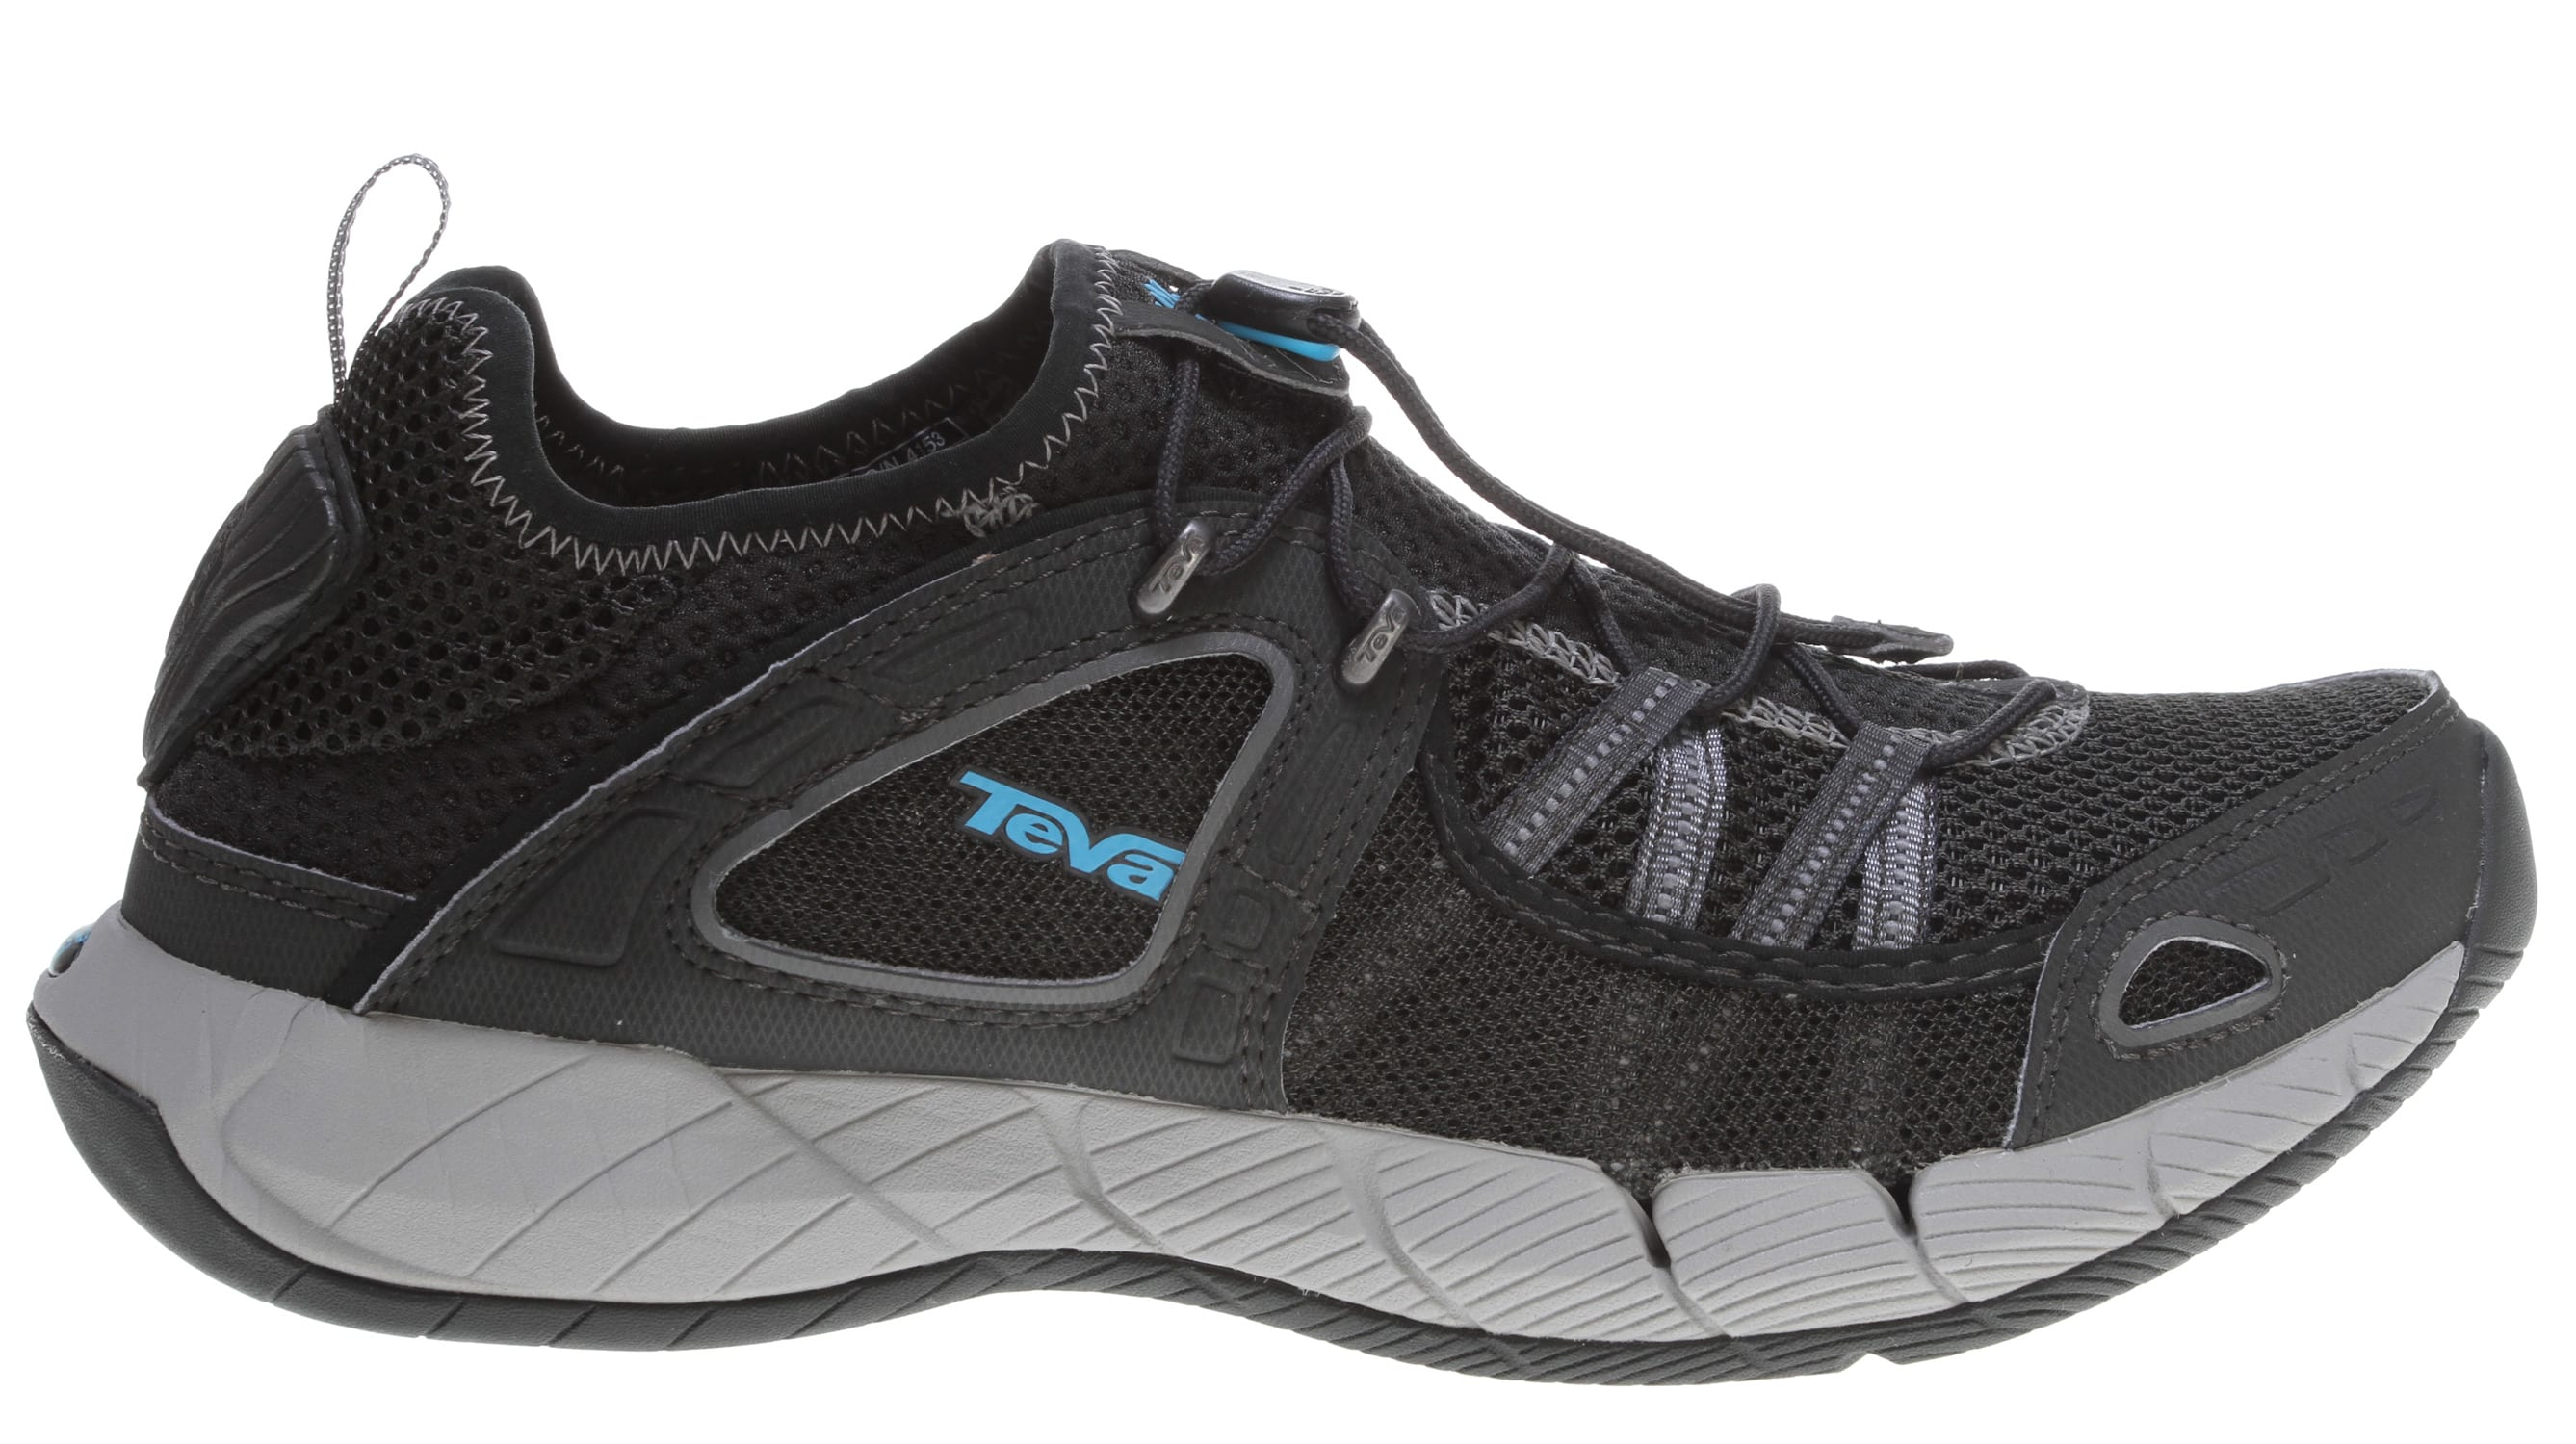 6e10d6a9972e Teva Churn Water Shoes